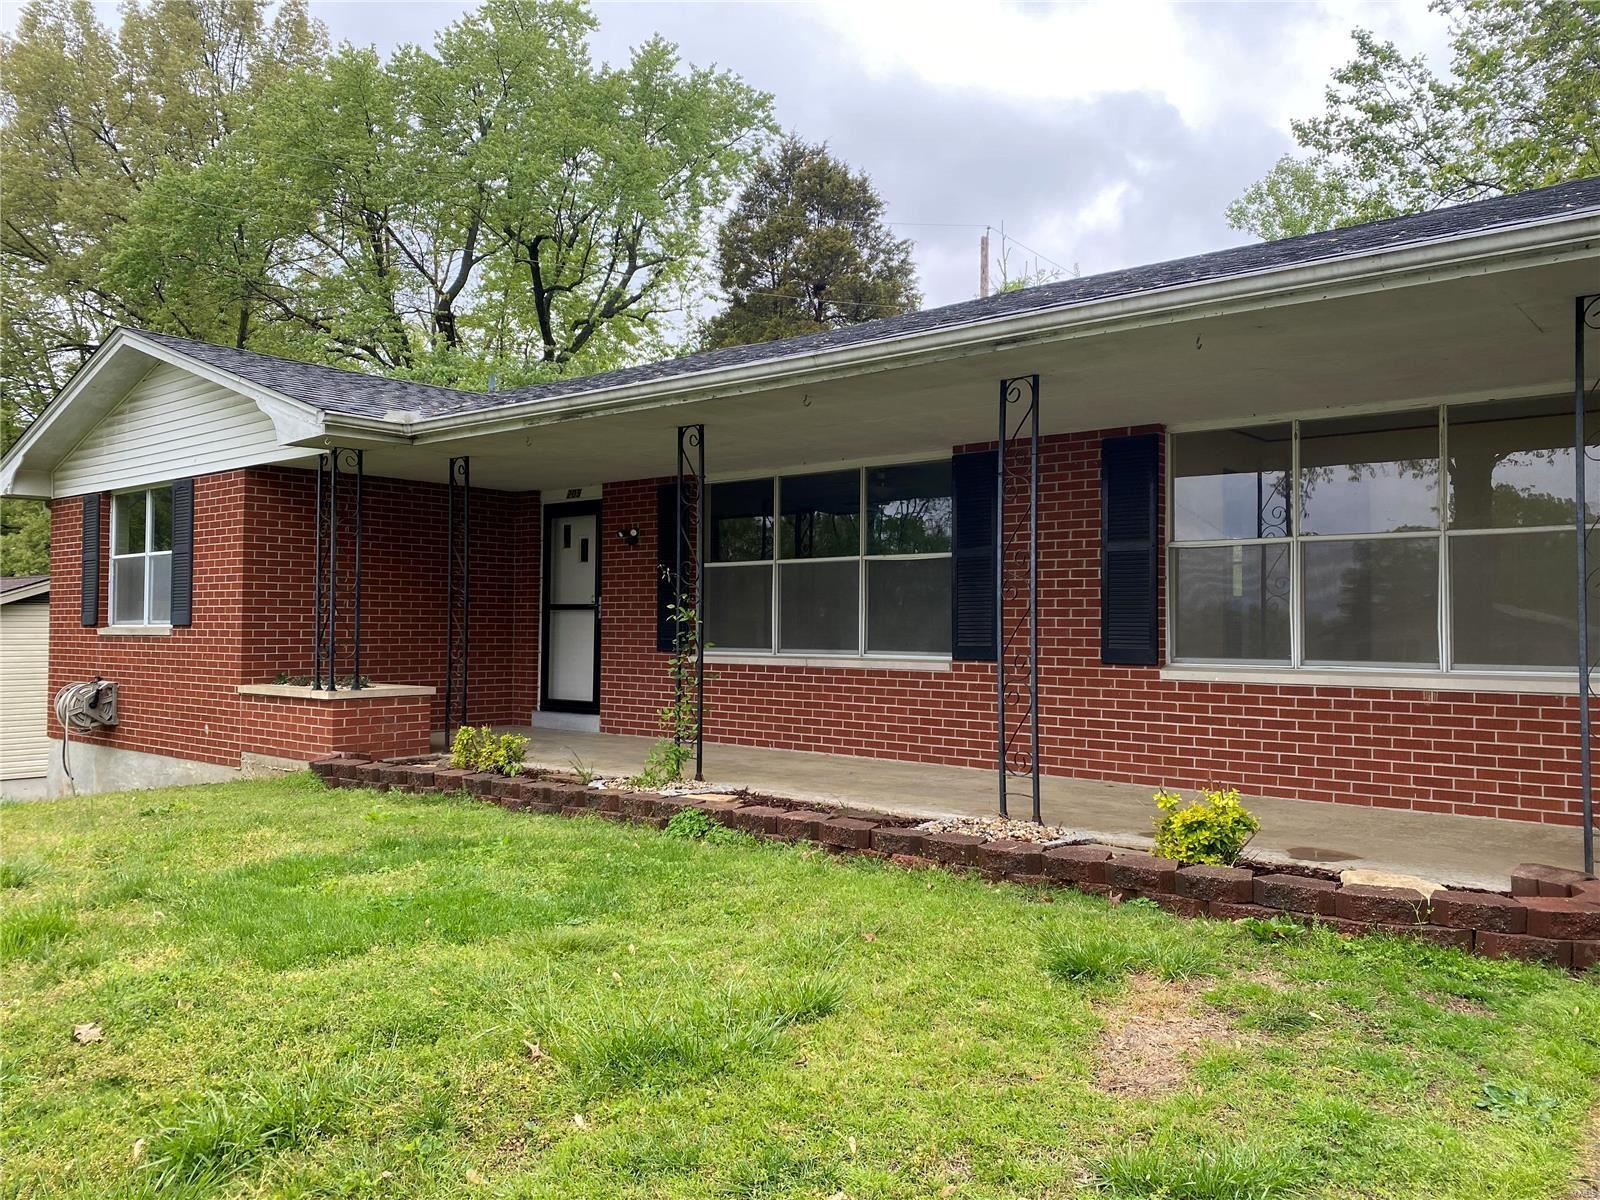 Photo of 209 Barberry, Cape Girardeau, MO 63703 (MLS # 21026620)